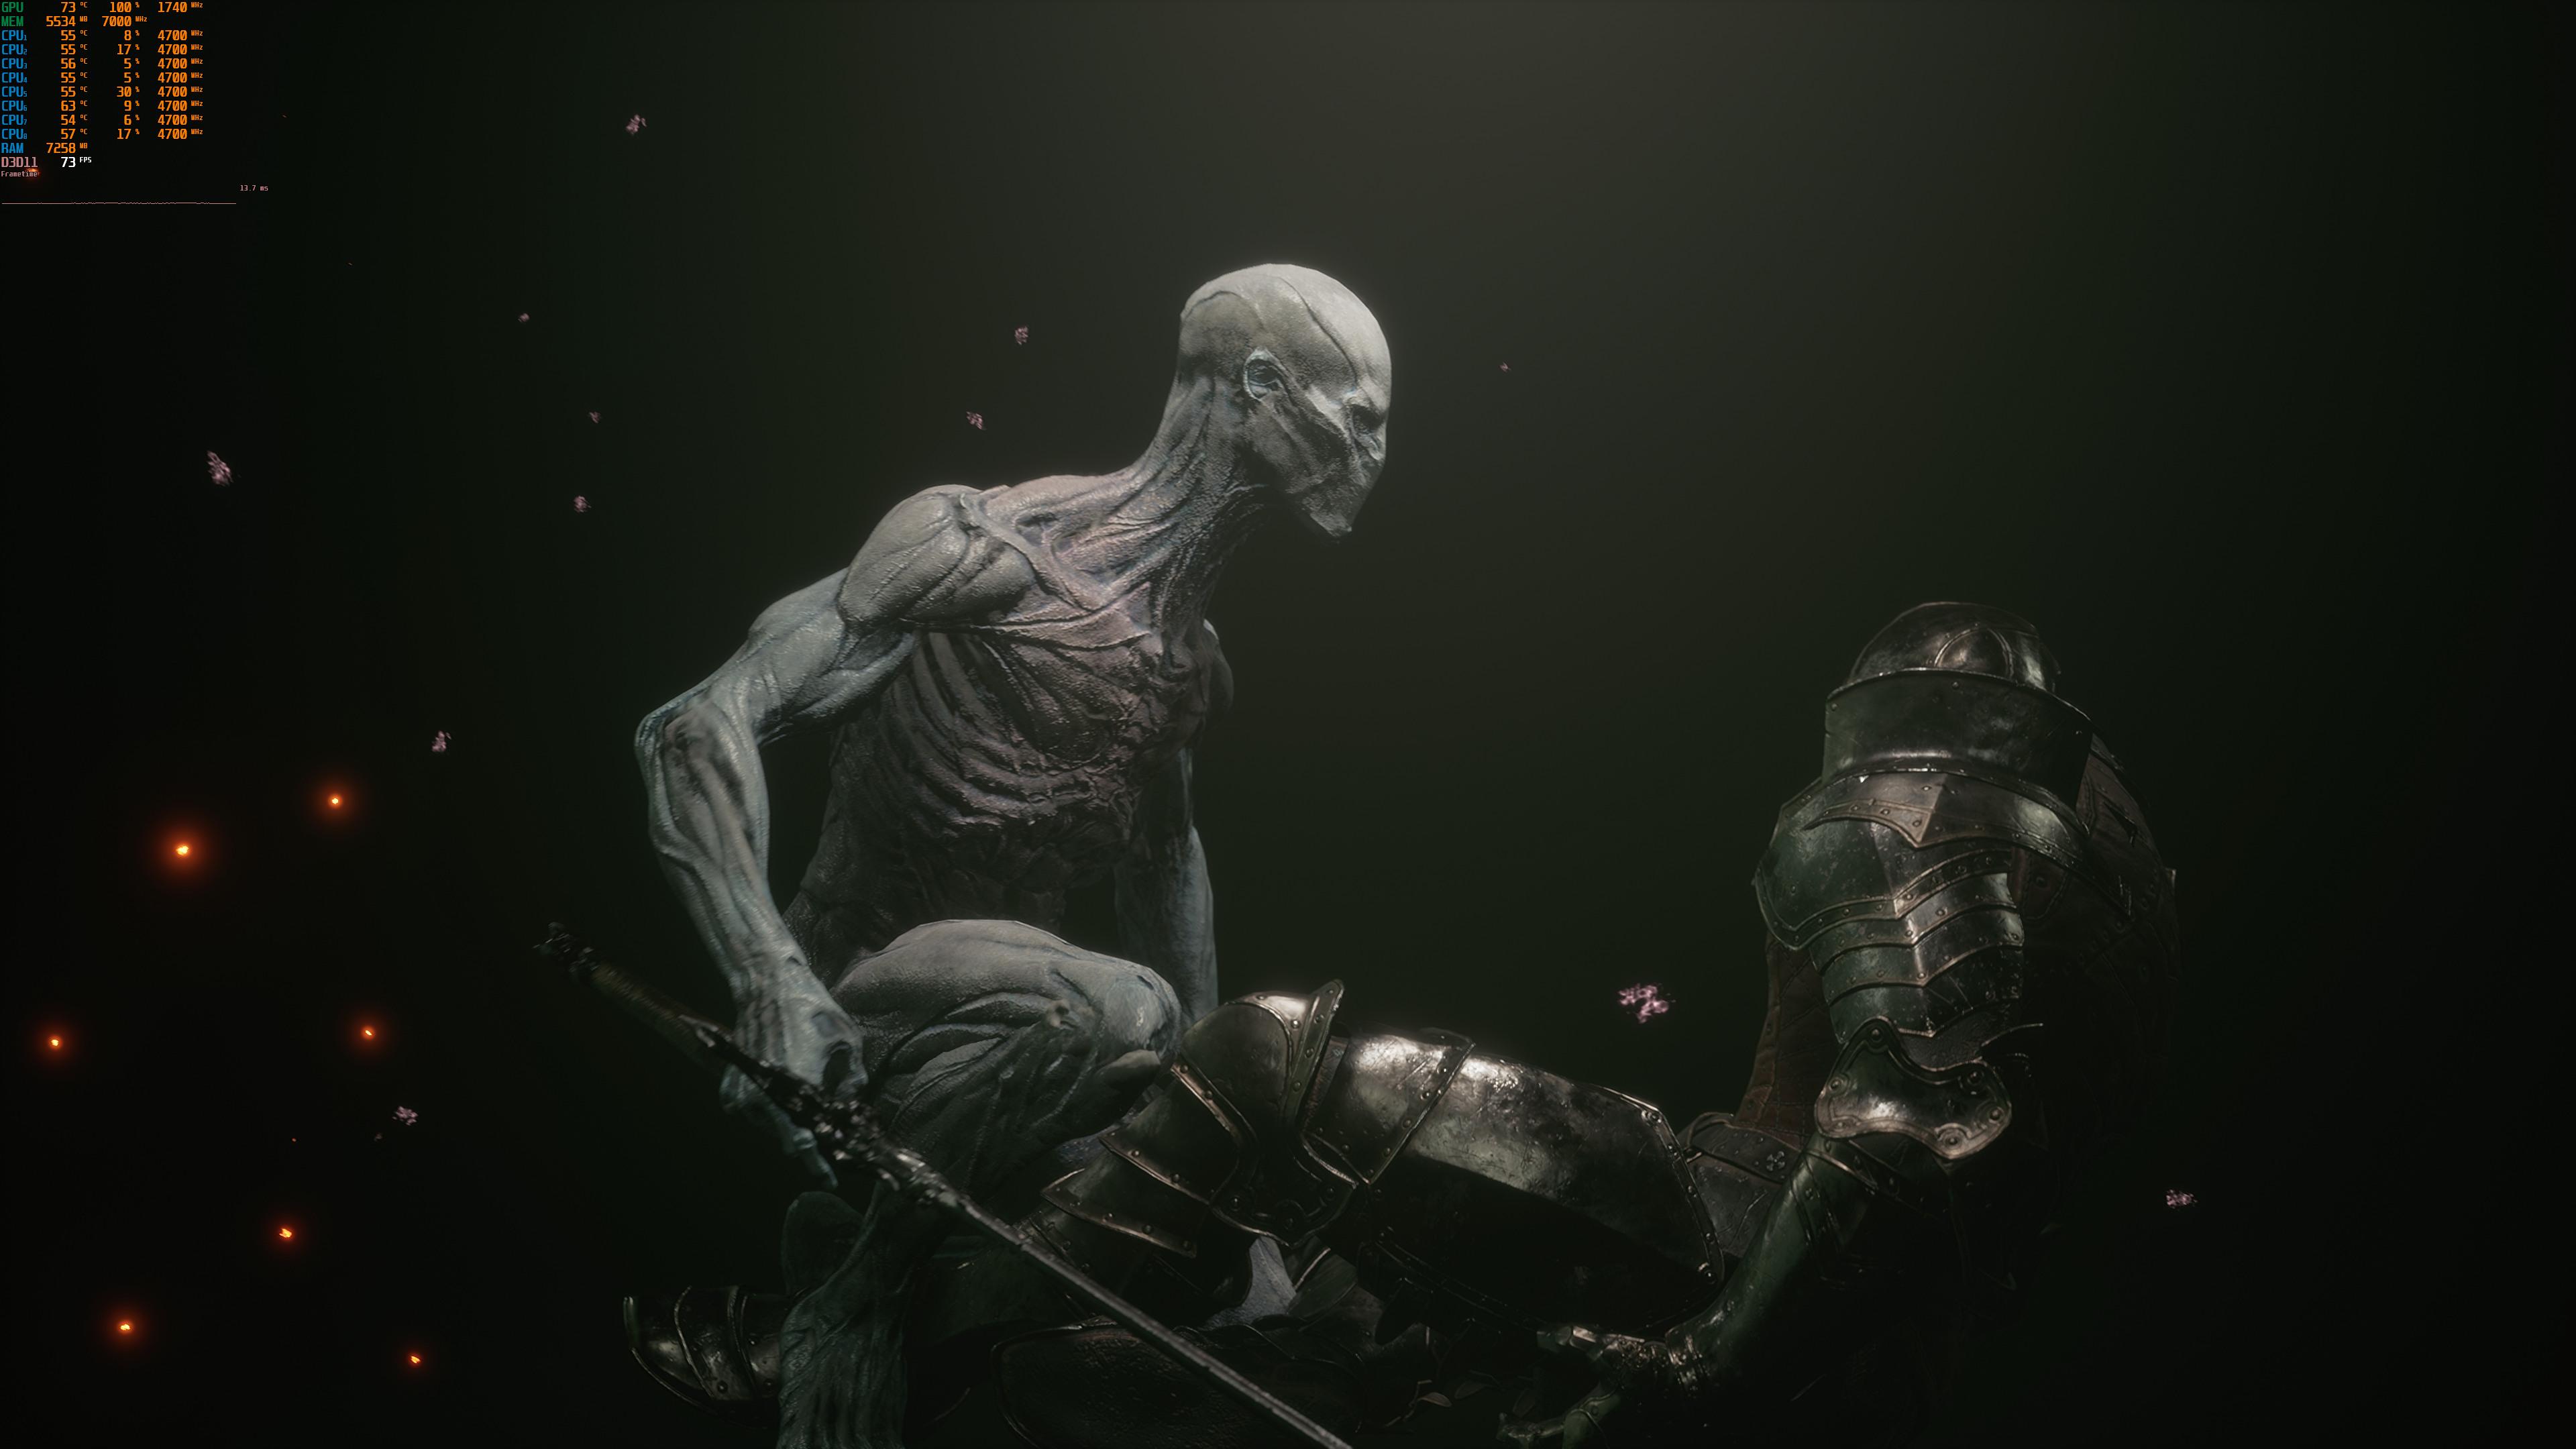 Скриншоты беты Mortal Shell в 4K/Ультра